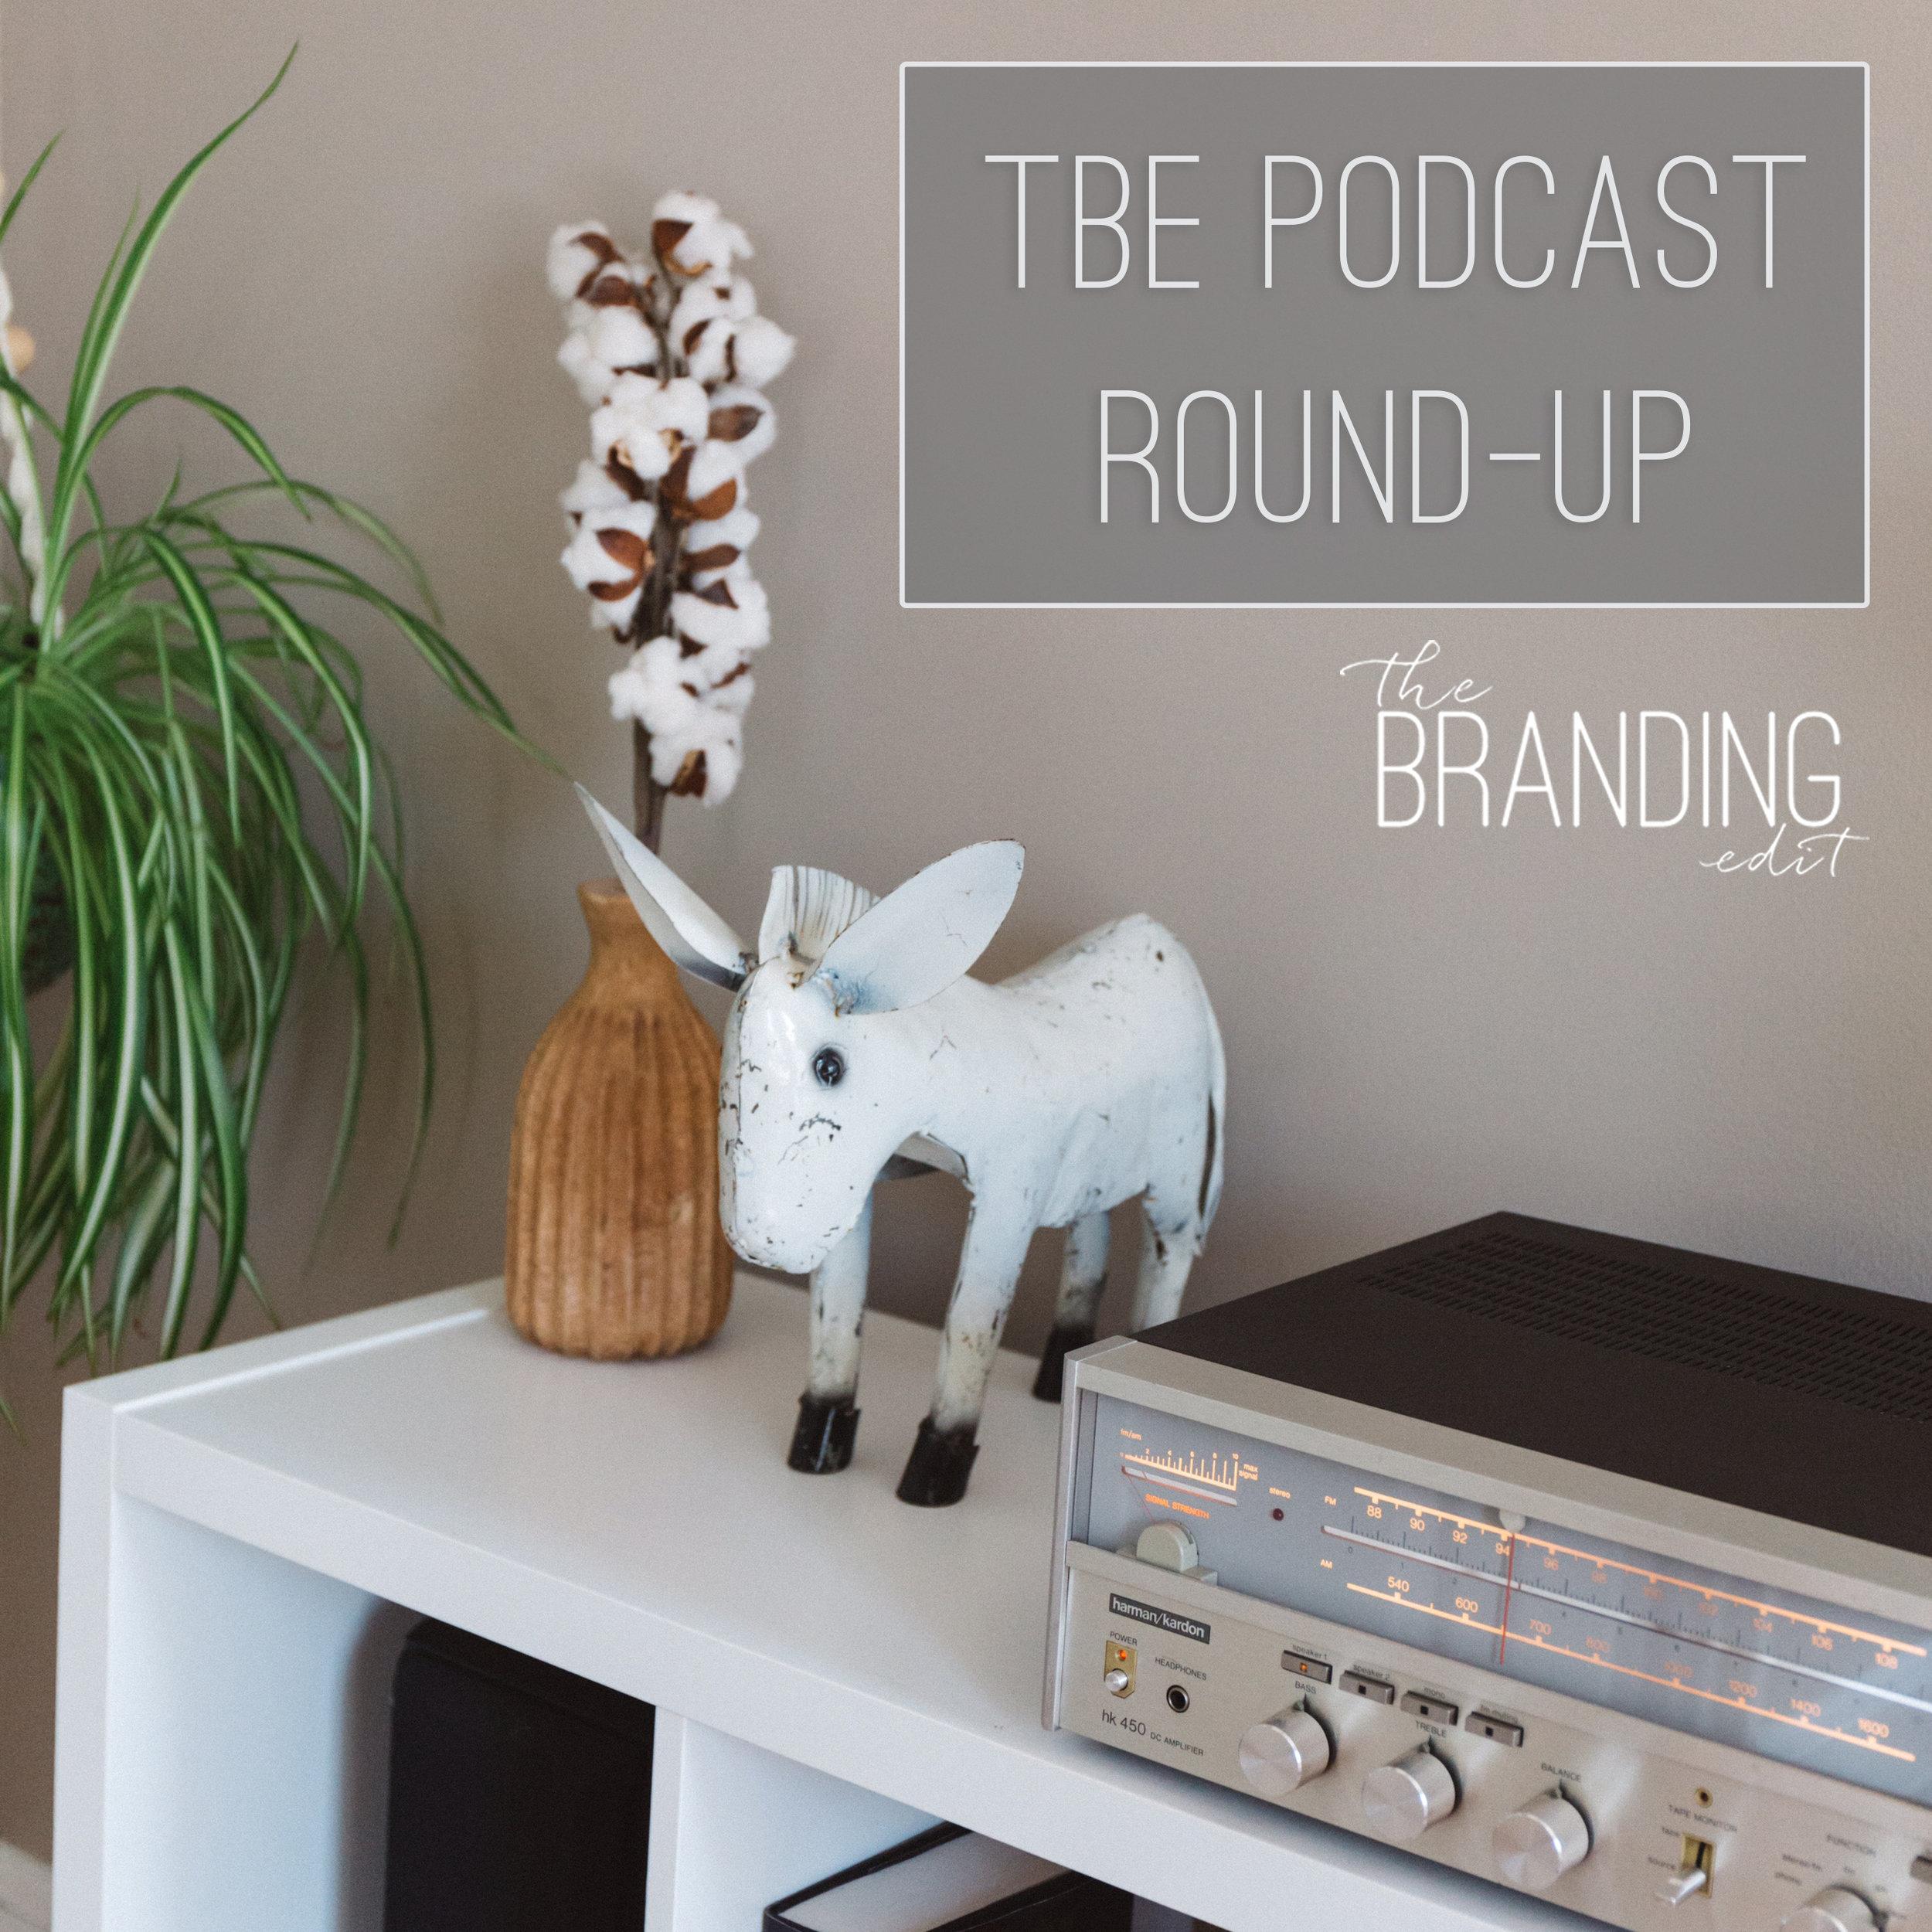 tbe-podcast-round-up.jpg